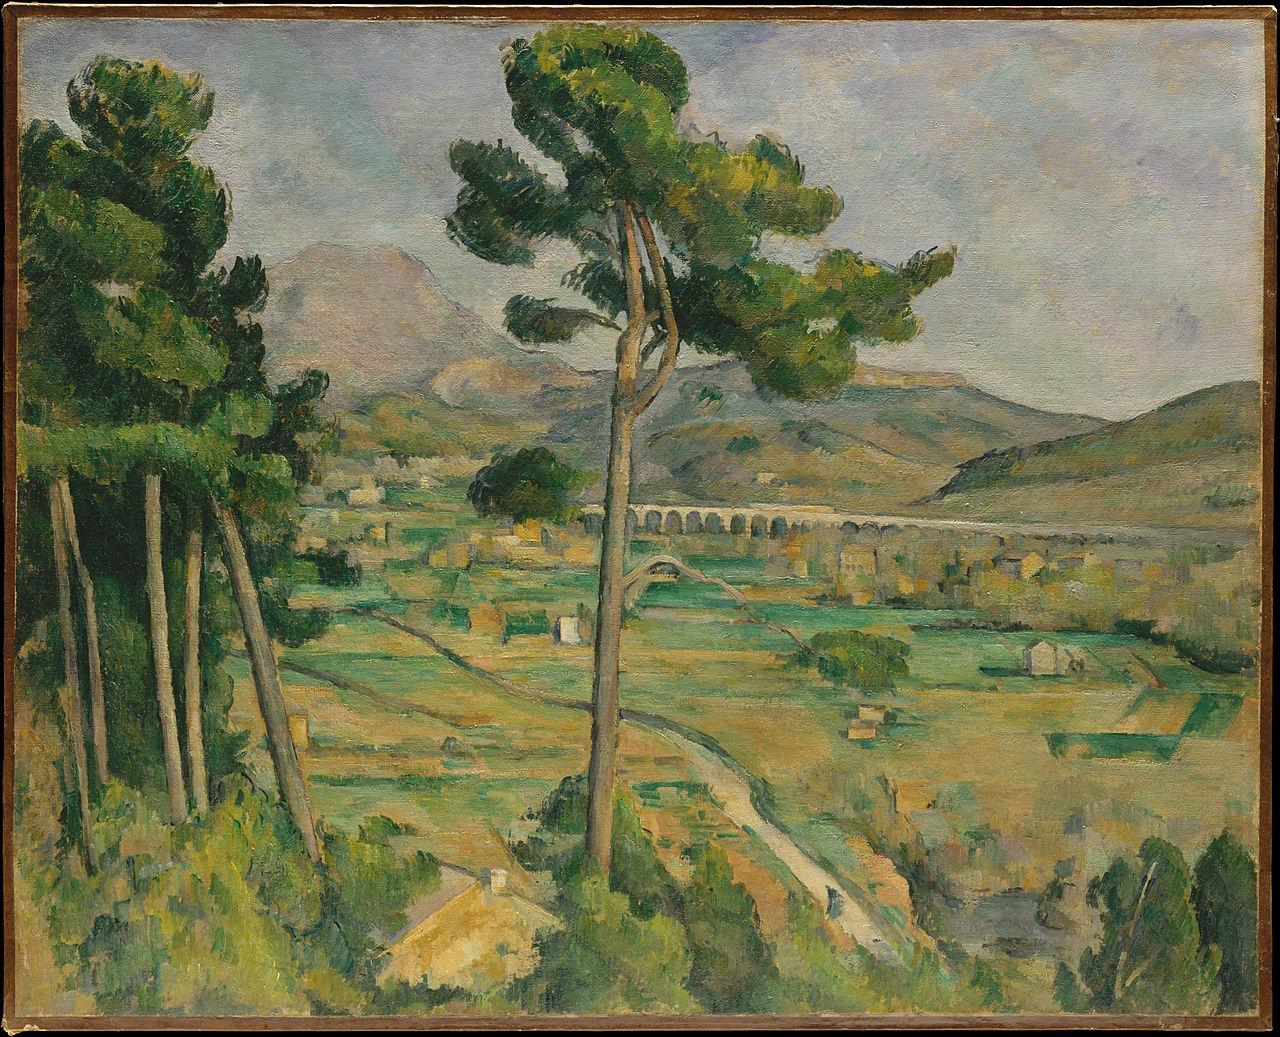 Поль Сезанн - «Гора Сент-Виктуар», 1882—1885, Метрополитен-музей, Нью-Йорк.